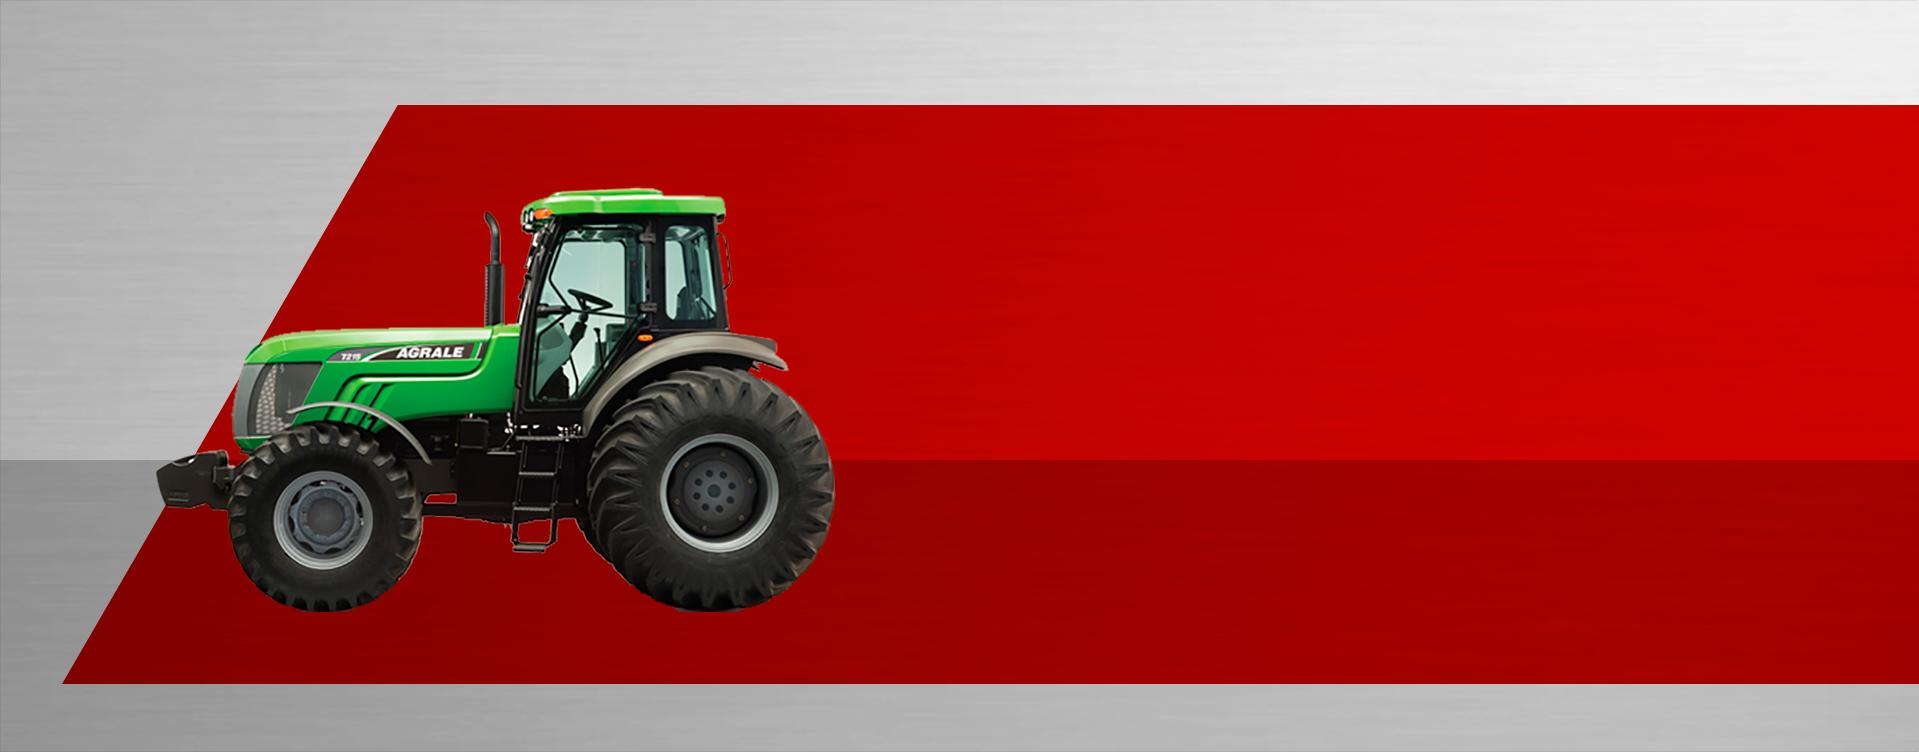 Filtro para Trator Agrale